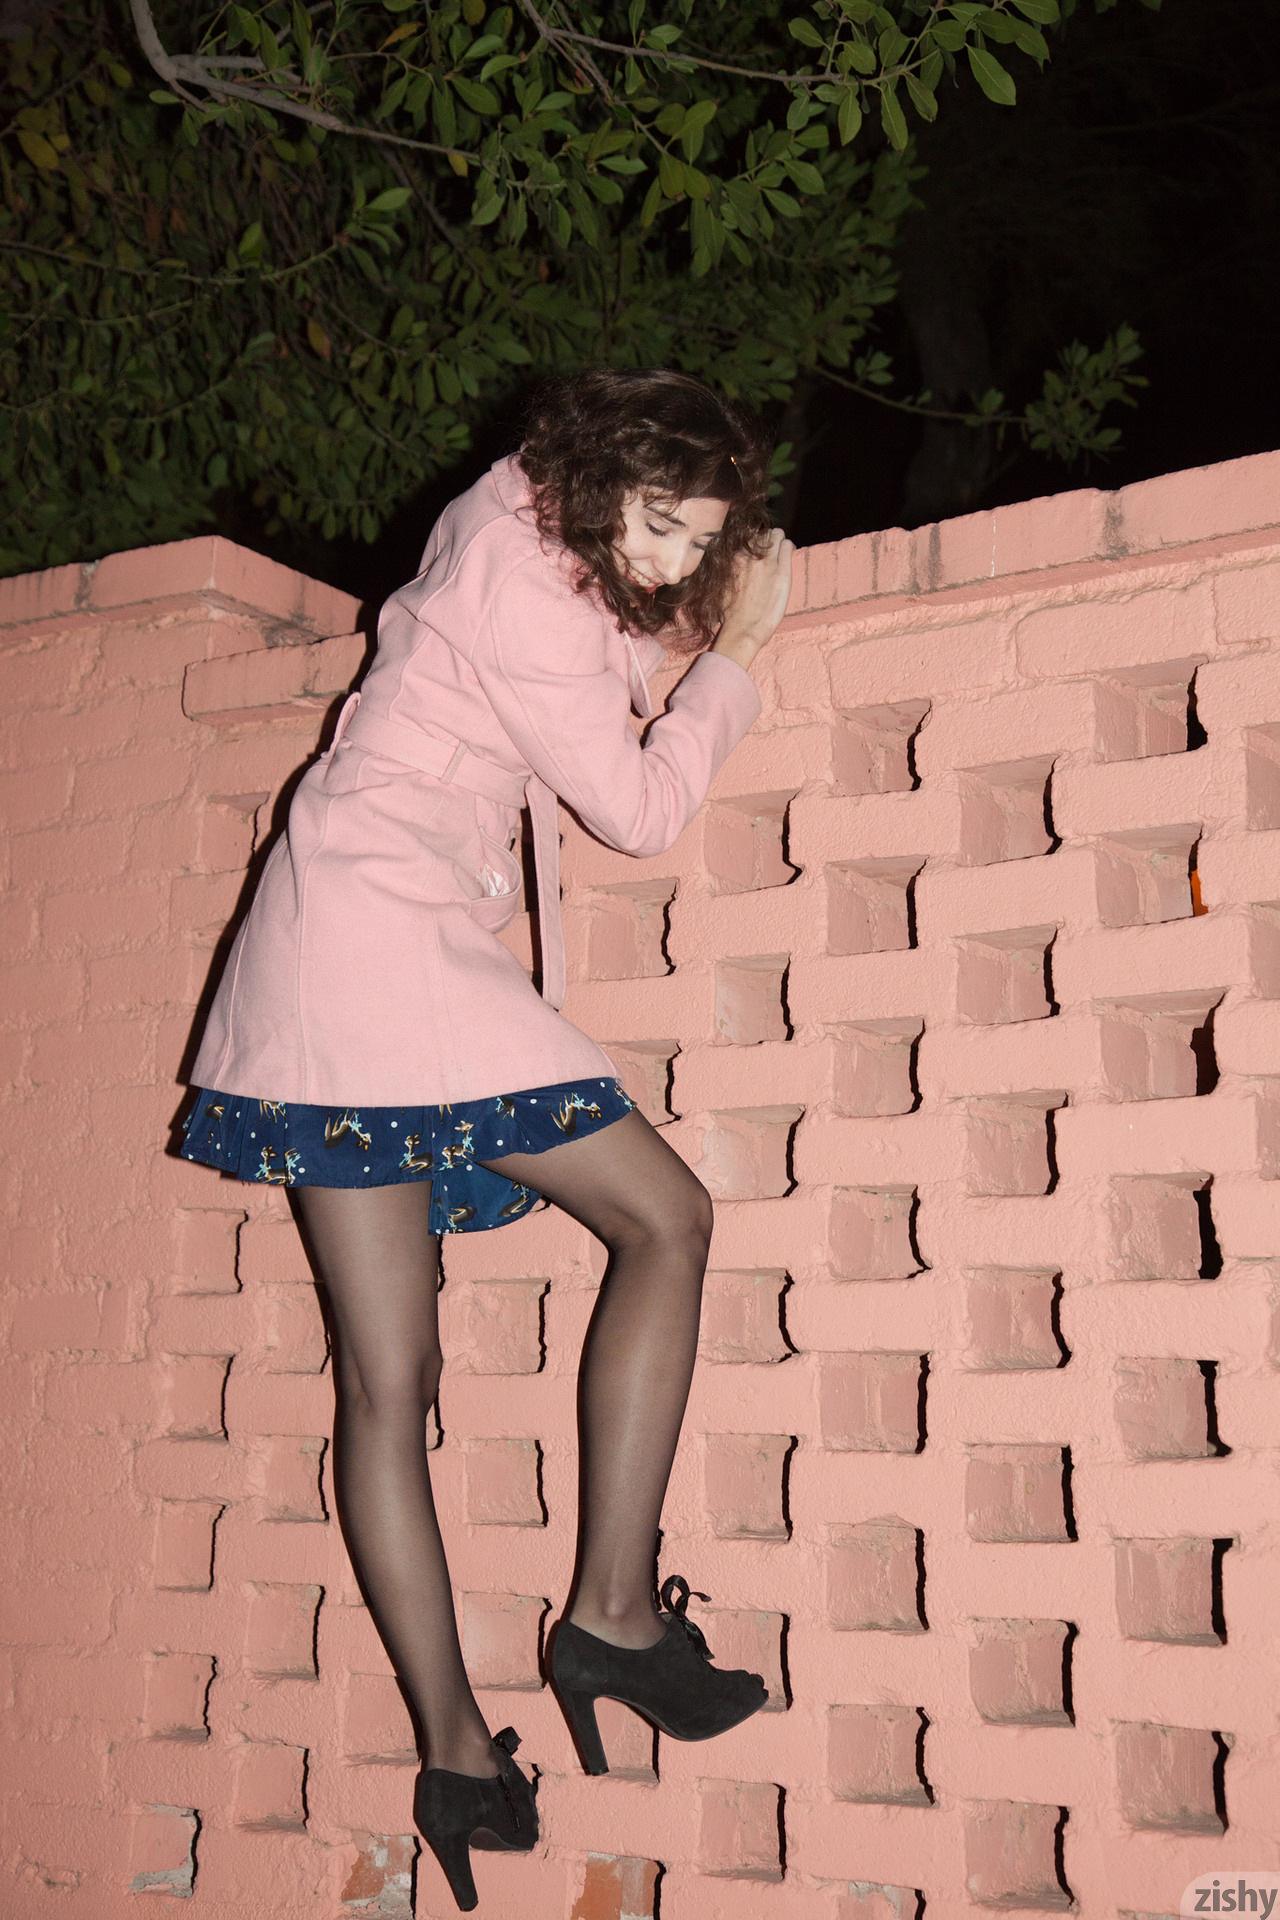 Yvette Nolot At Arizona Inn Zishy (46)